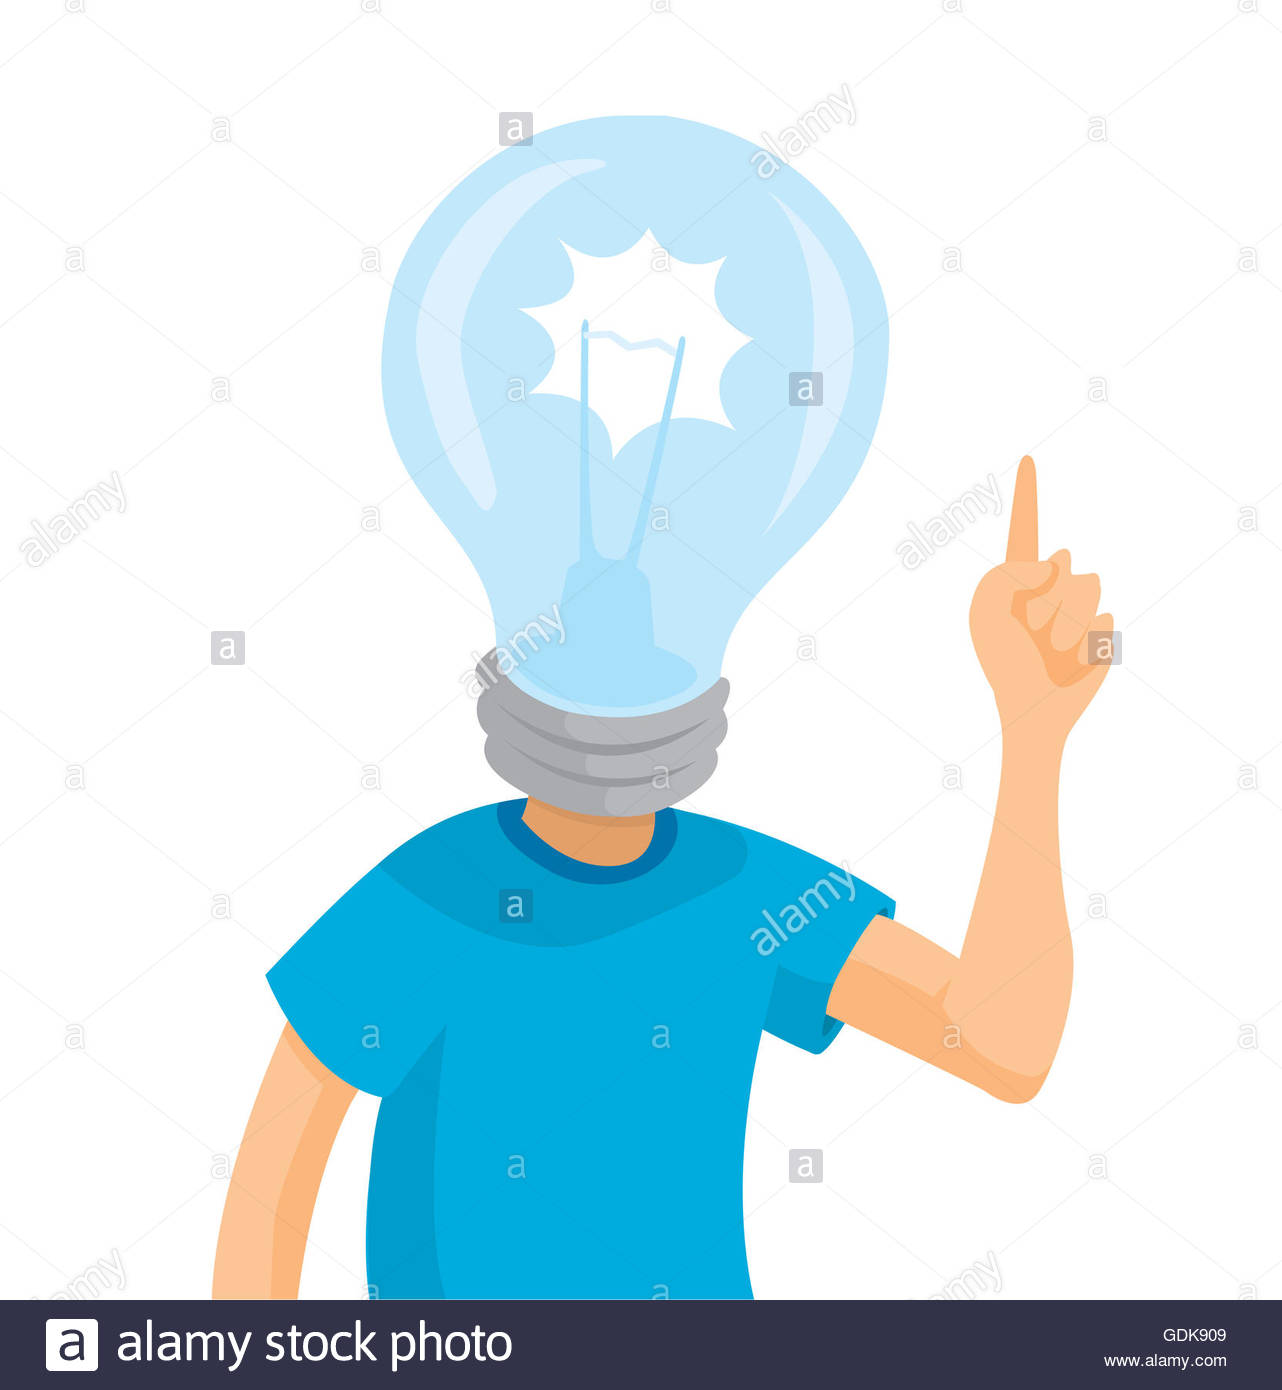 1282x1390 Cartoon Illustration Of Idea Man Or Light Bulb Head Stock Photo